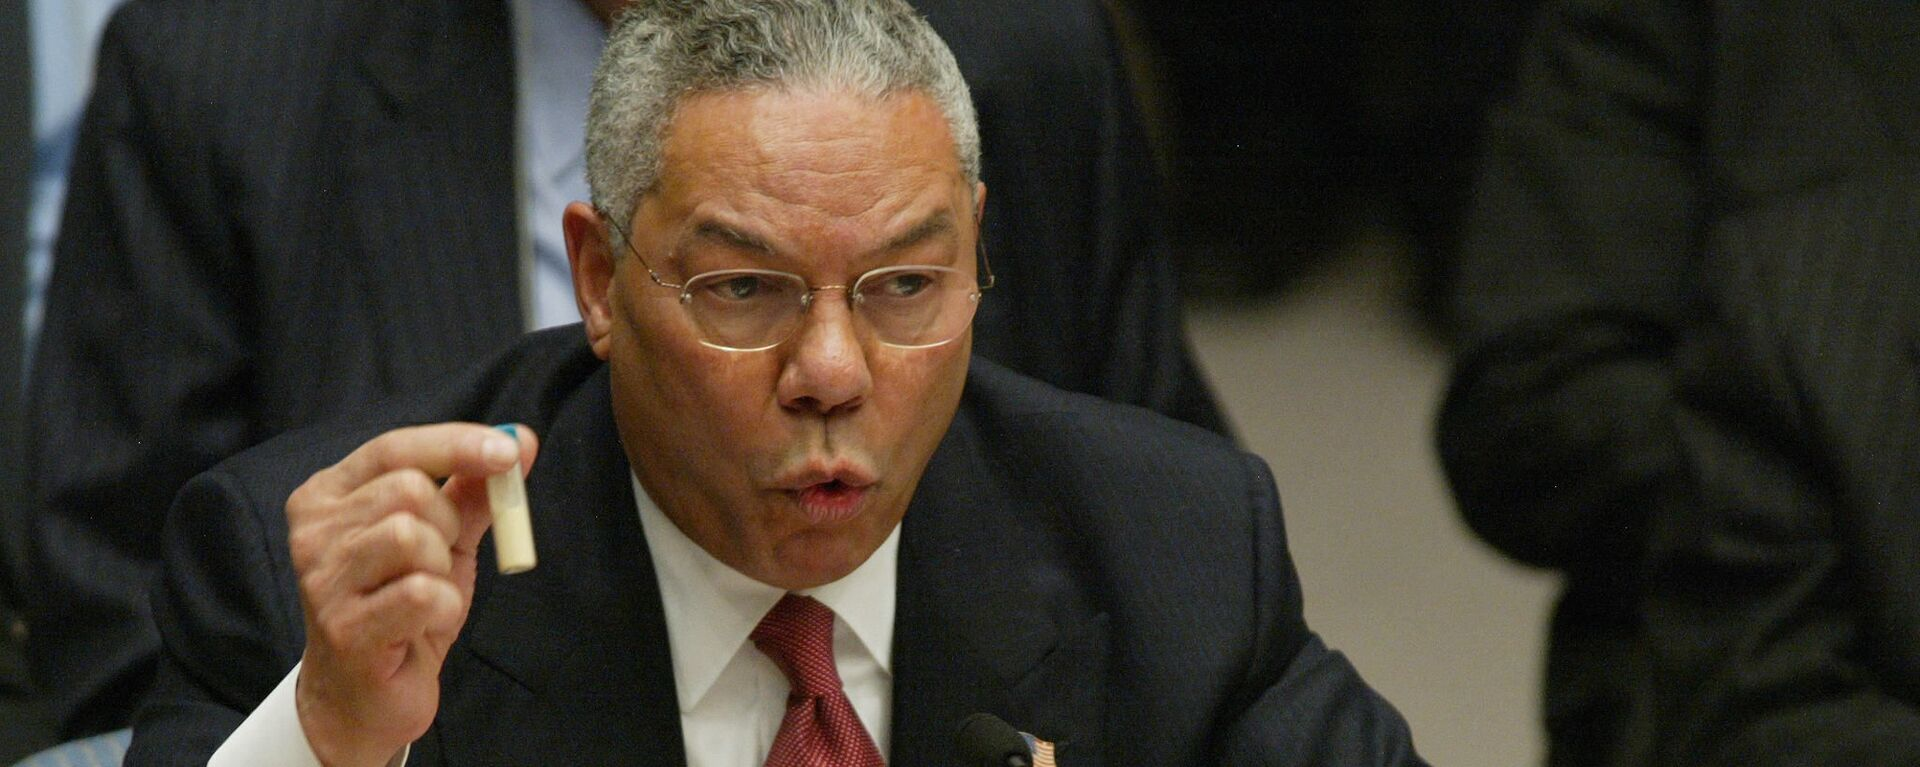 Ex-Außenminister Colin Powell (Archivbild) - SNA, 1920, 18.10.2021